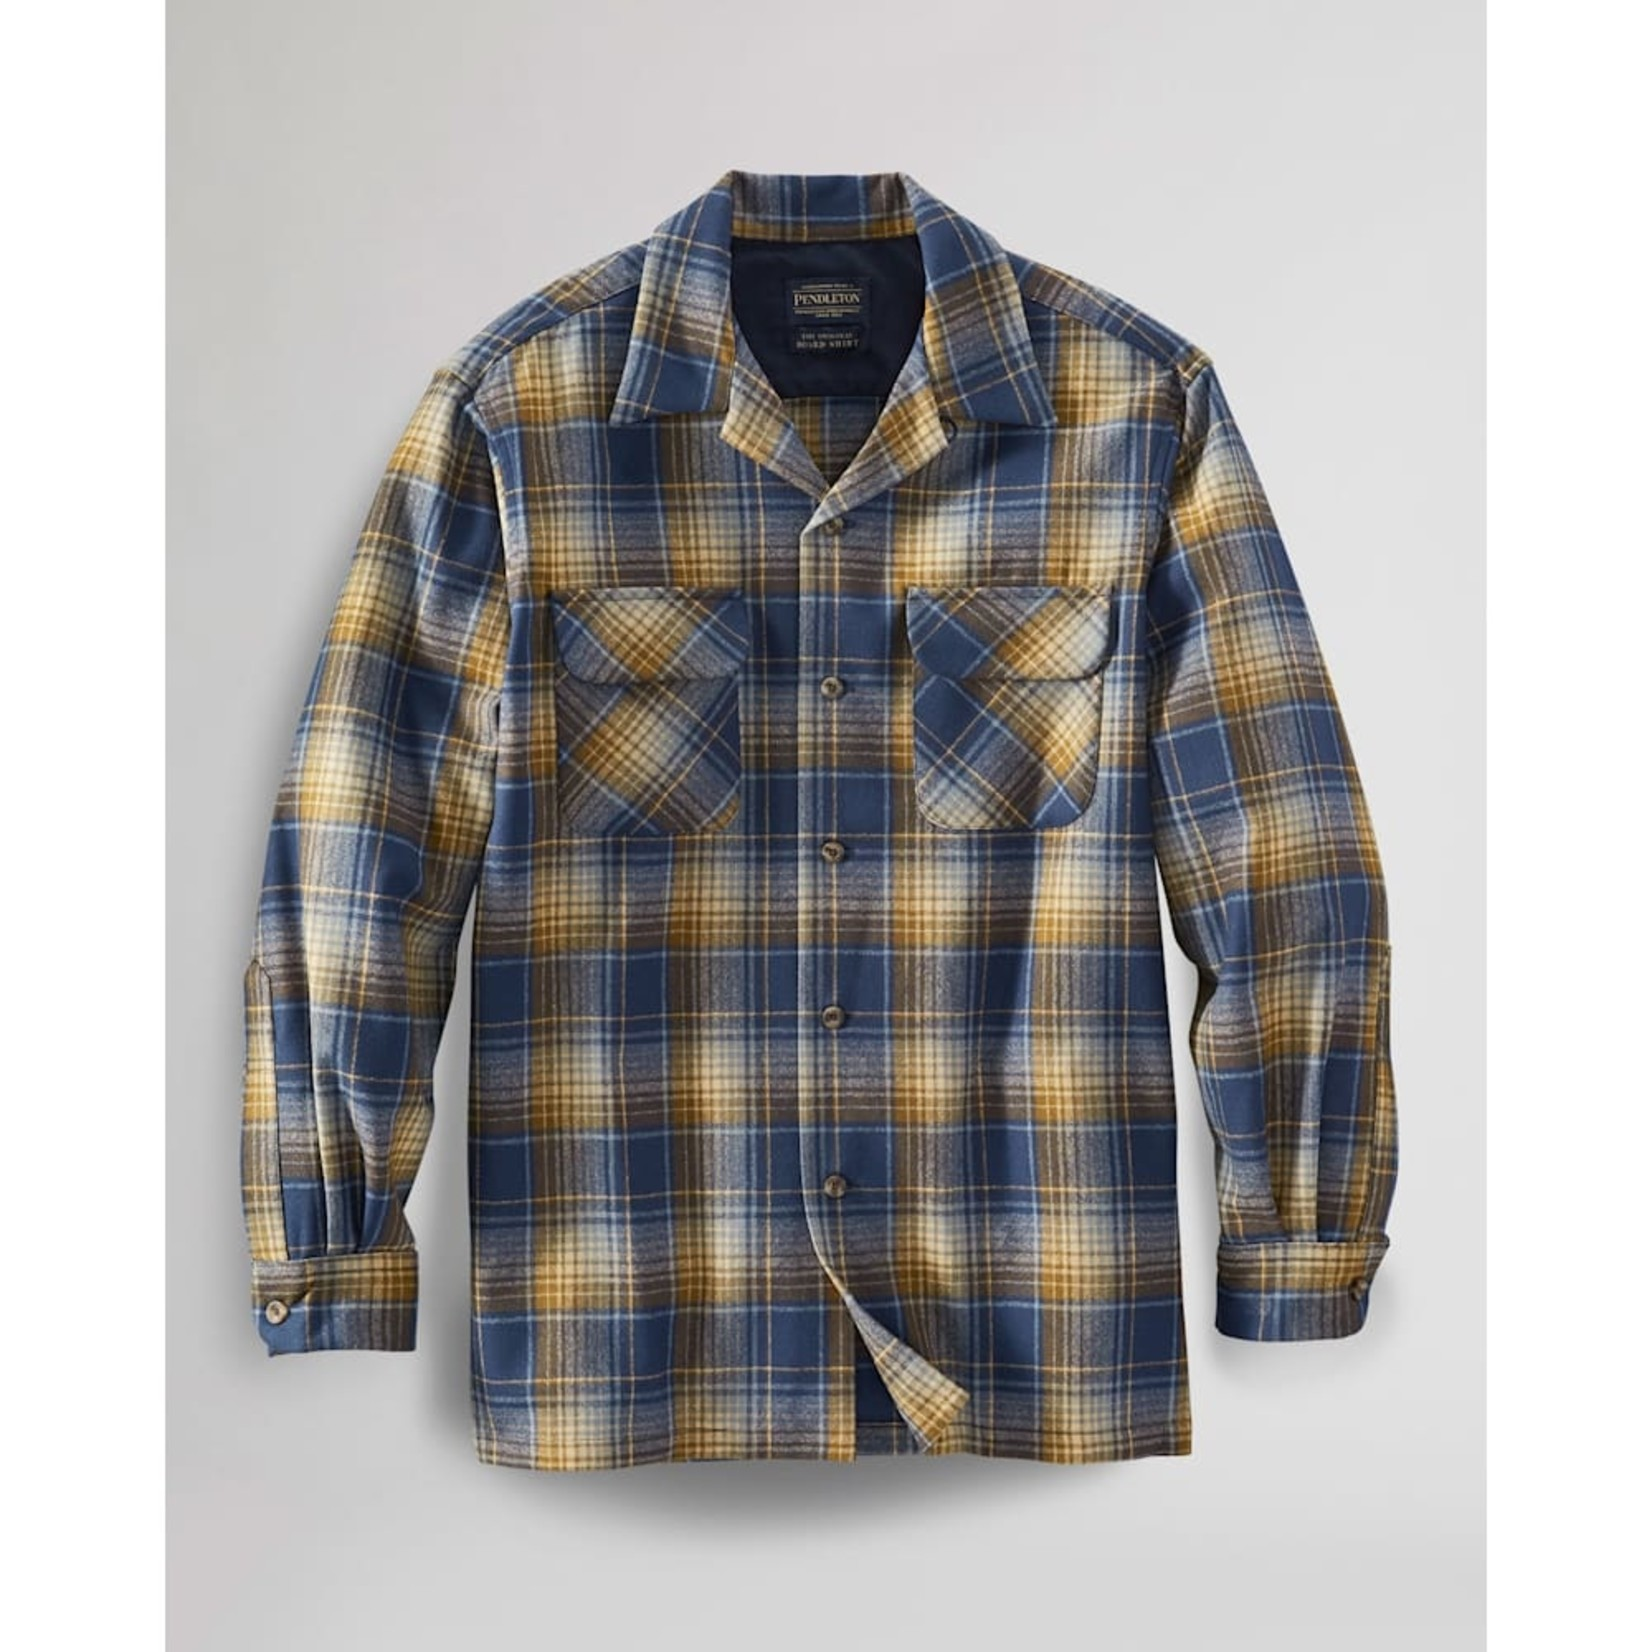 Pendleton Pendleton Fitted Board Shirt RA072-32416